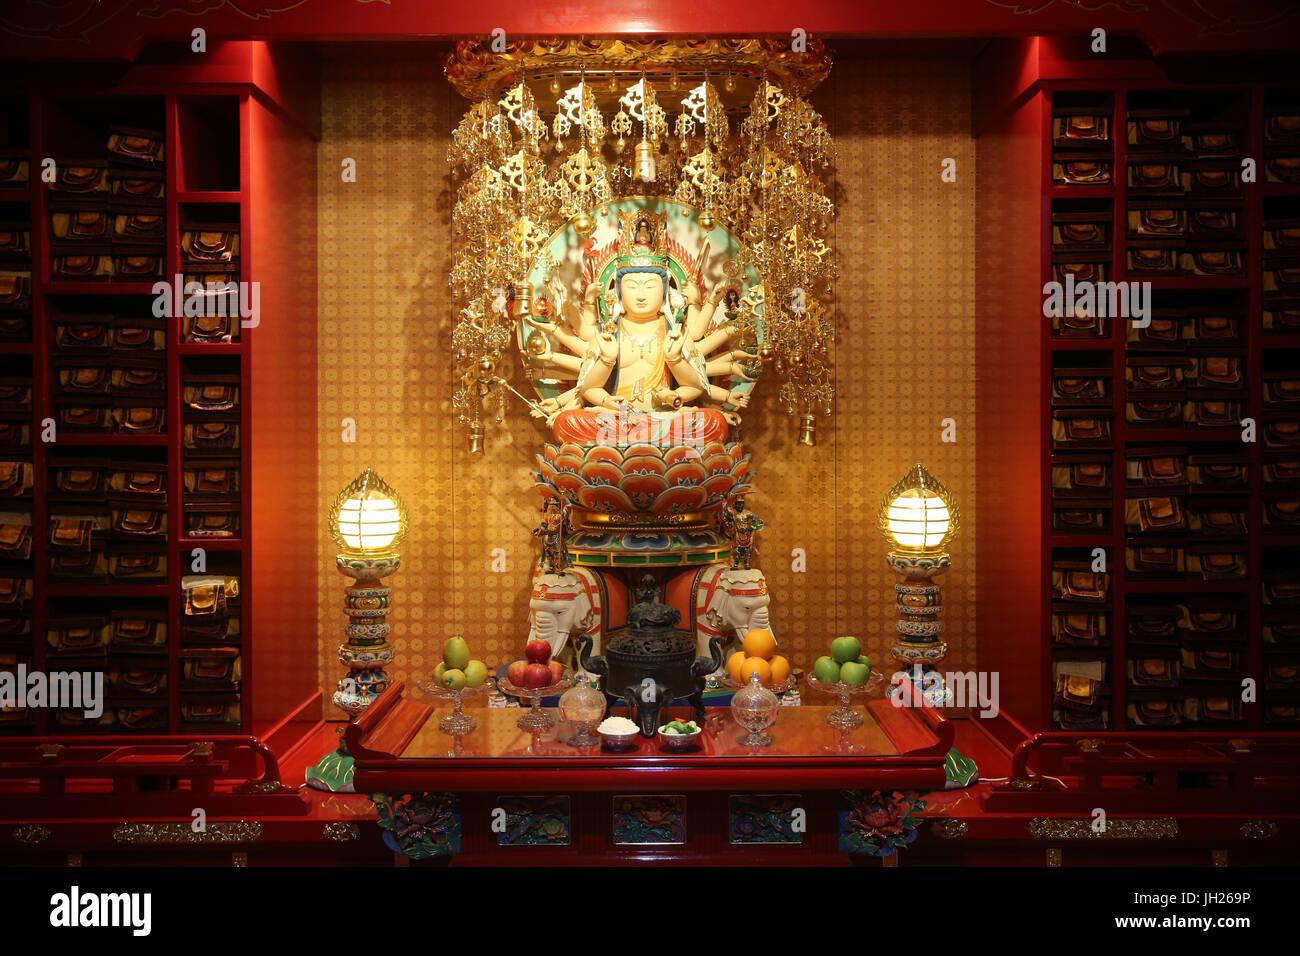 Dente del Buddha reliquia tempio in Chinatown. Longevità Bodhisattva Samantabhadra statua. Singapore. Immagini Stock